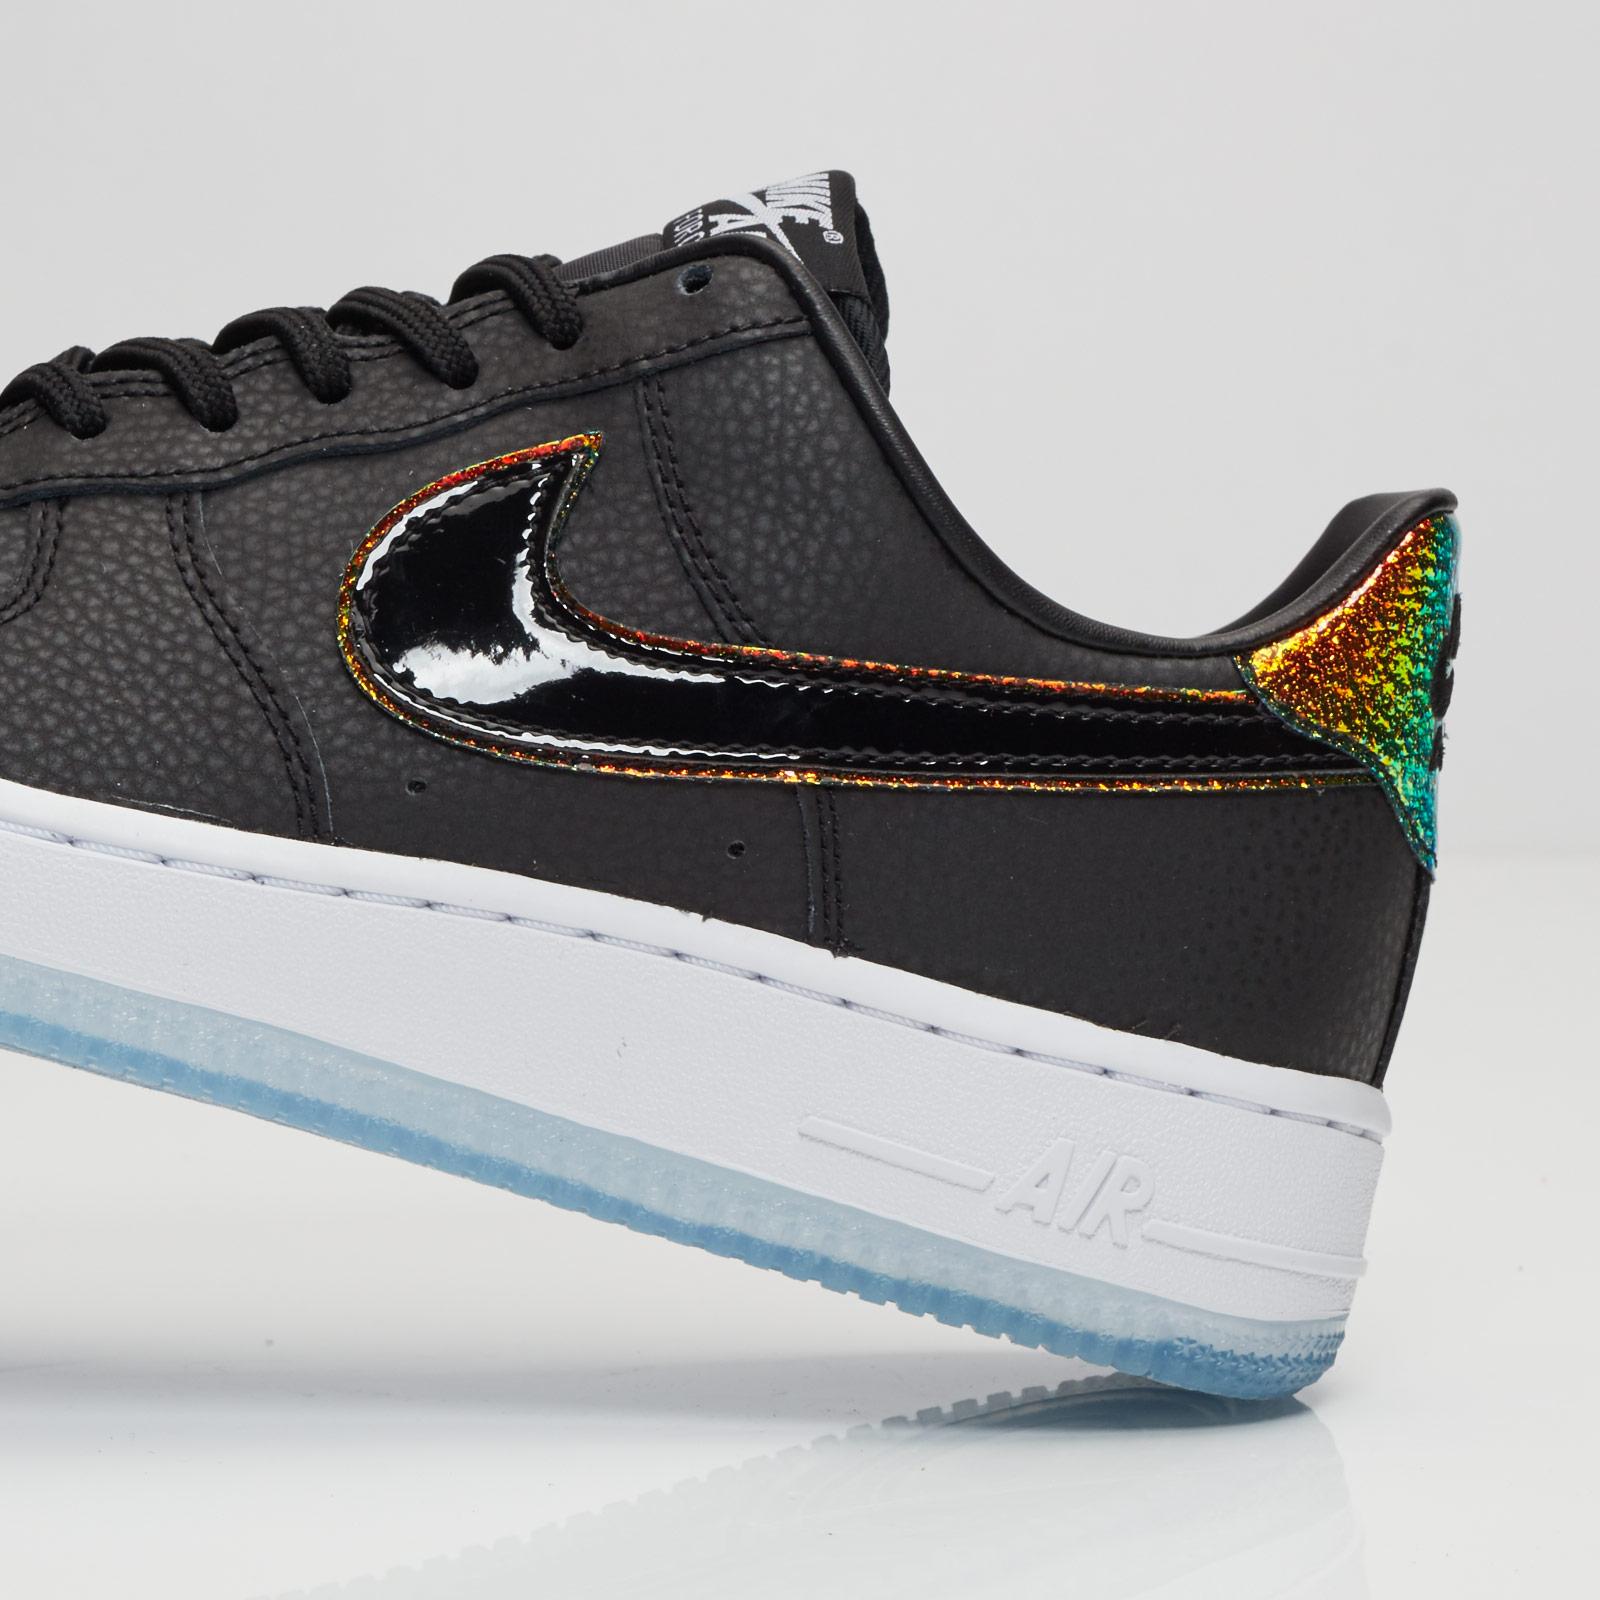 online store 51272 5d9fe Nike Wmns Air Force 1 07 Premium - 616725-007 - Sneakersnstuff   sneakers    streetwear online since 1999